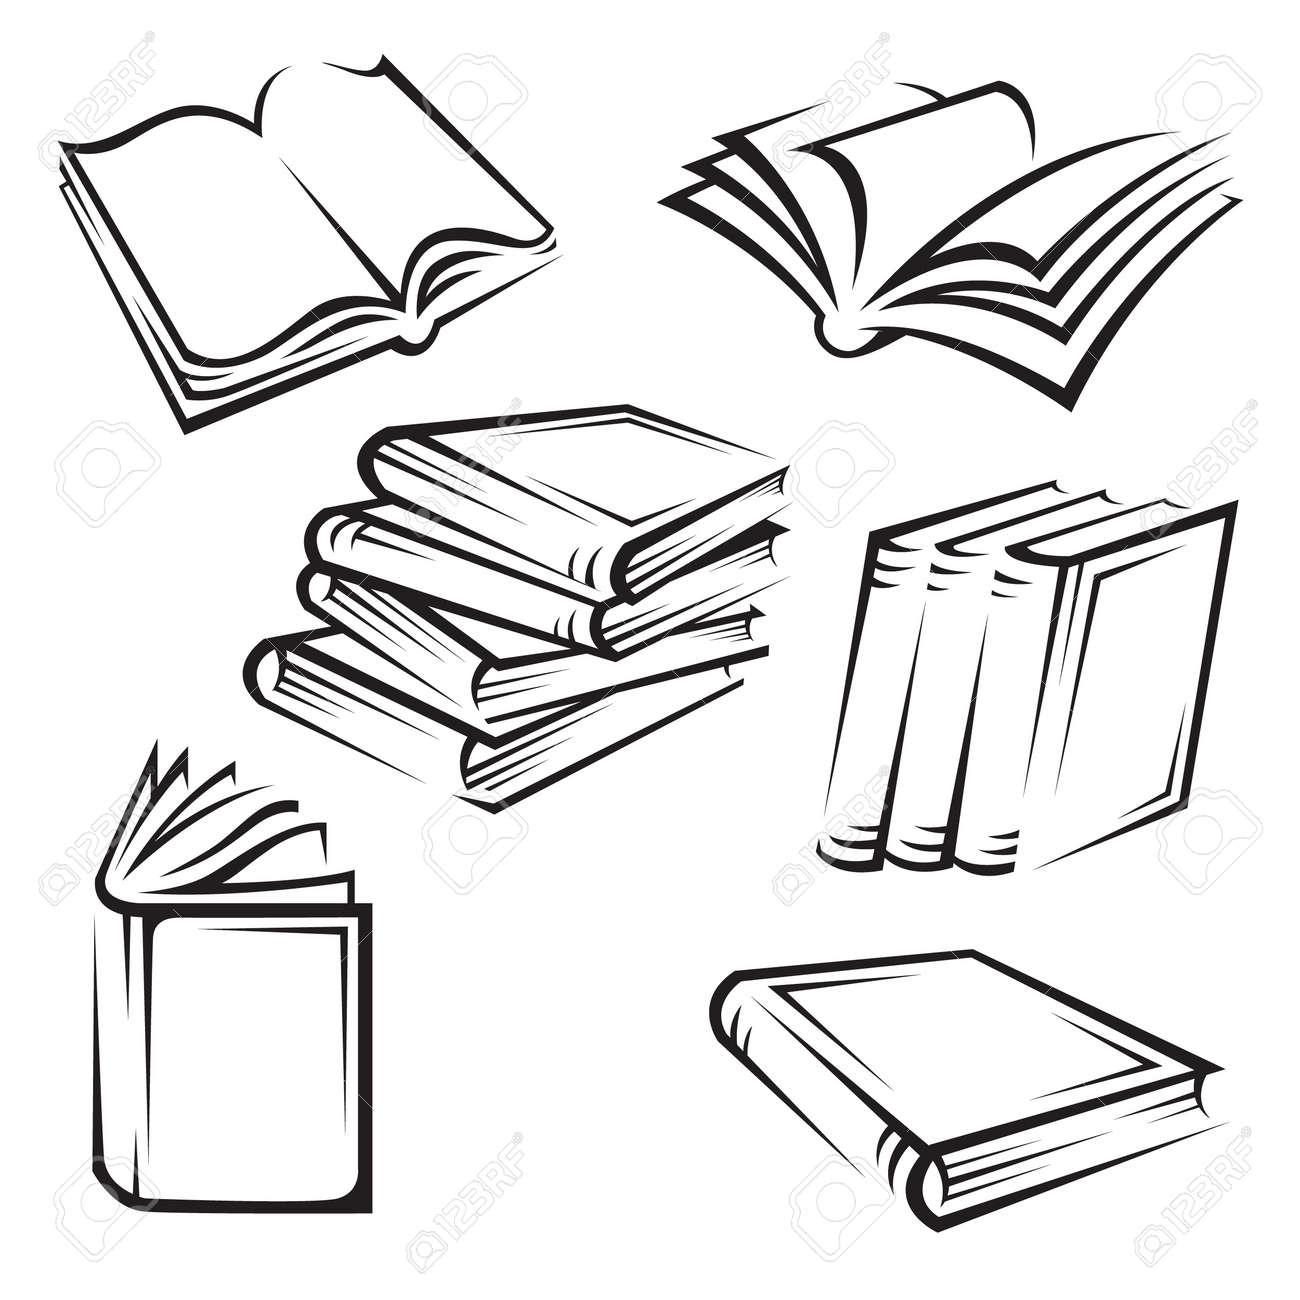 books Stock Vector - 11650400